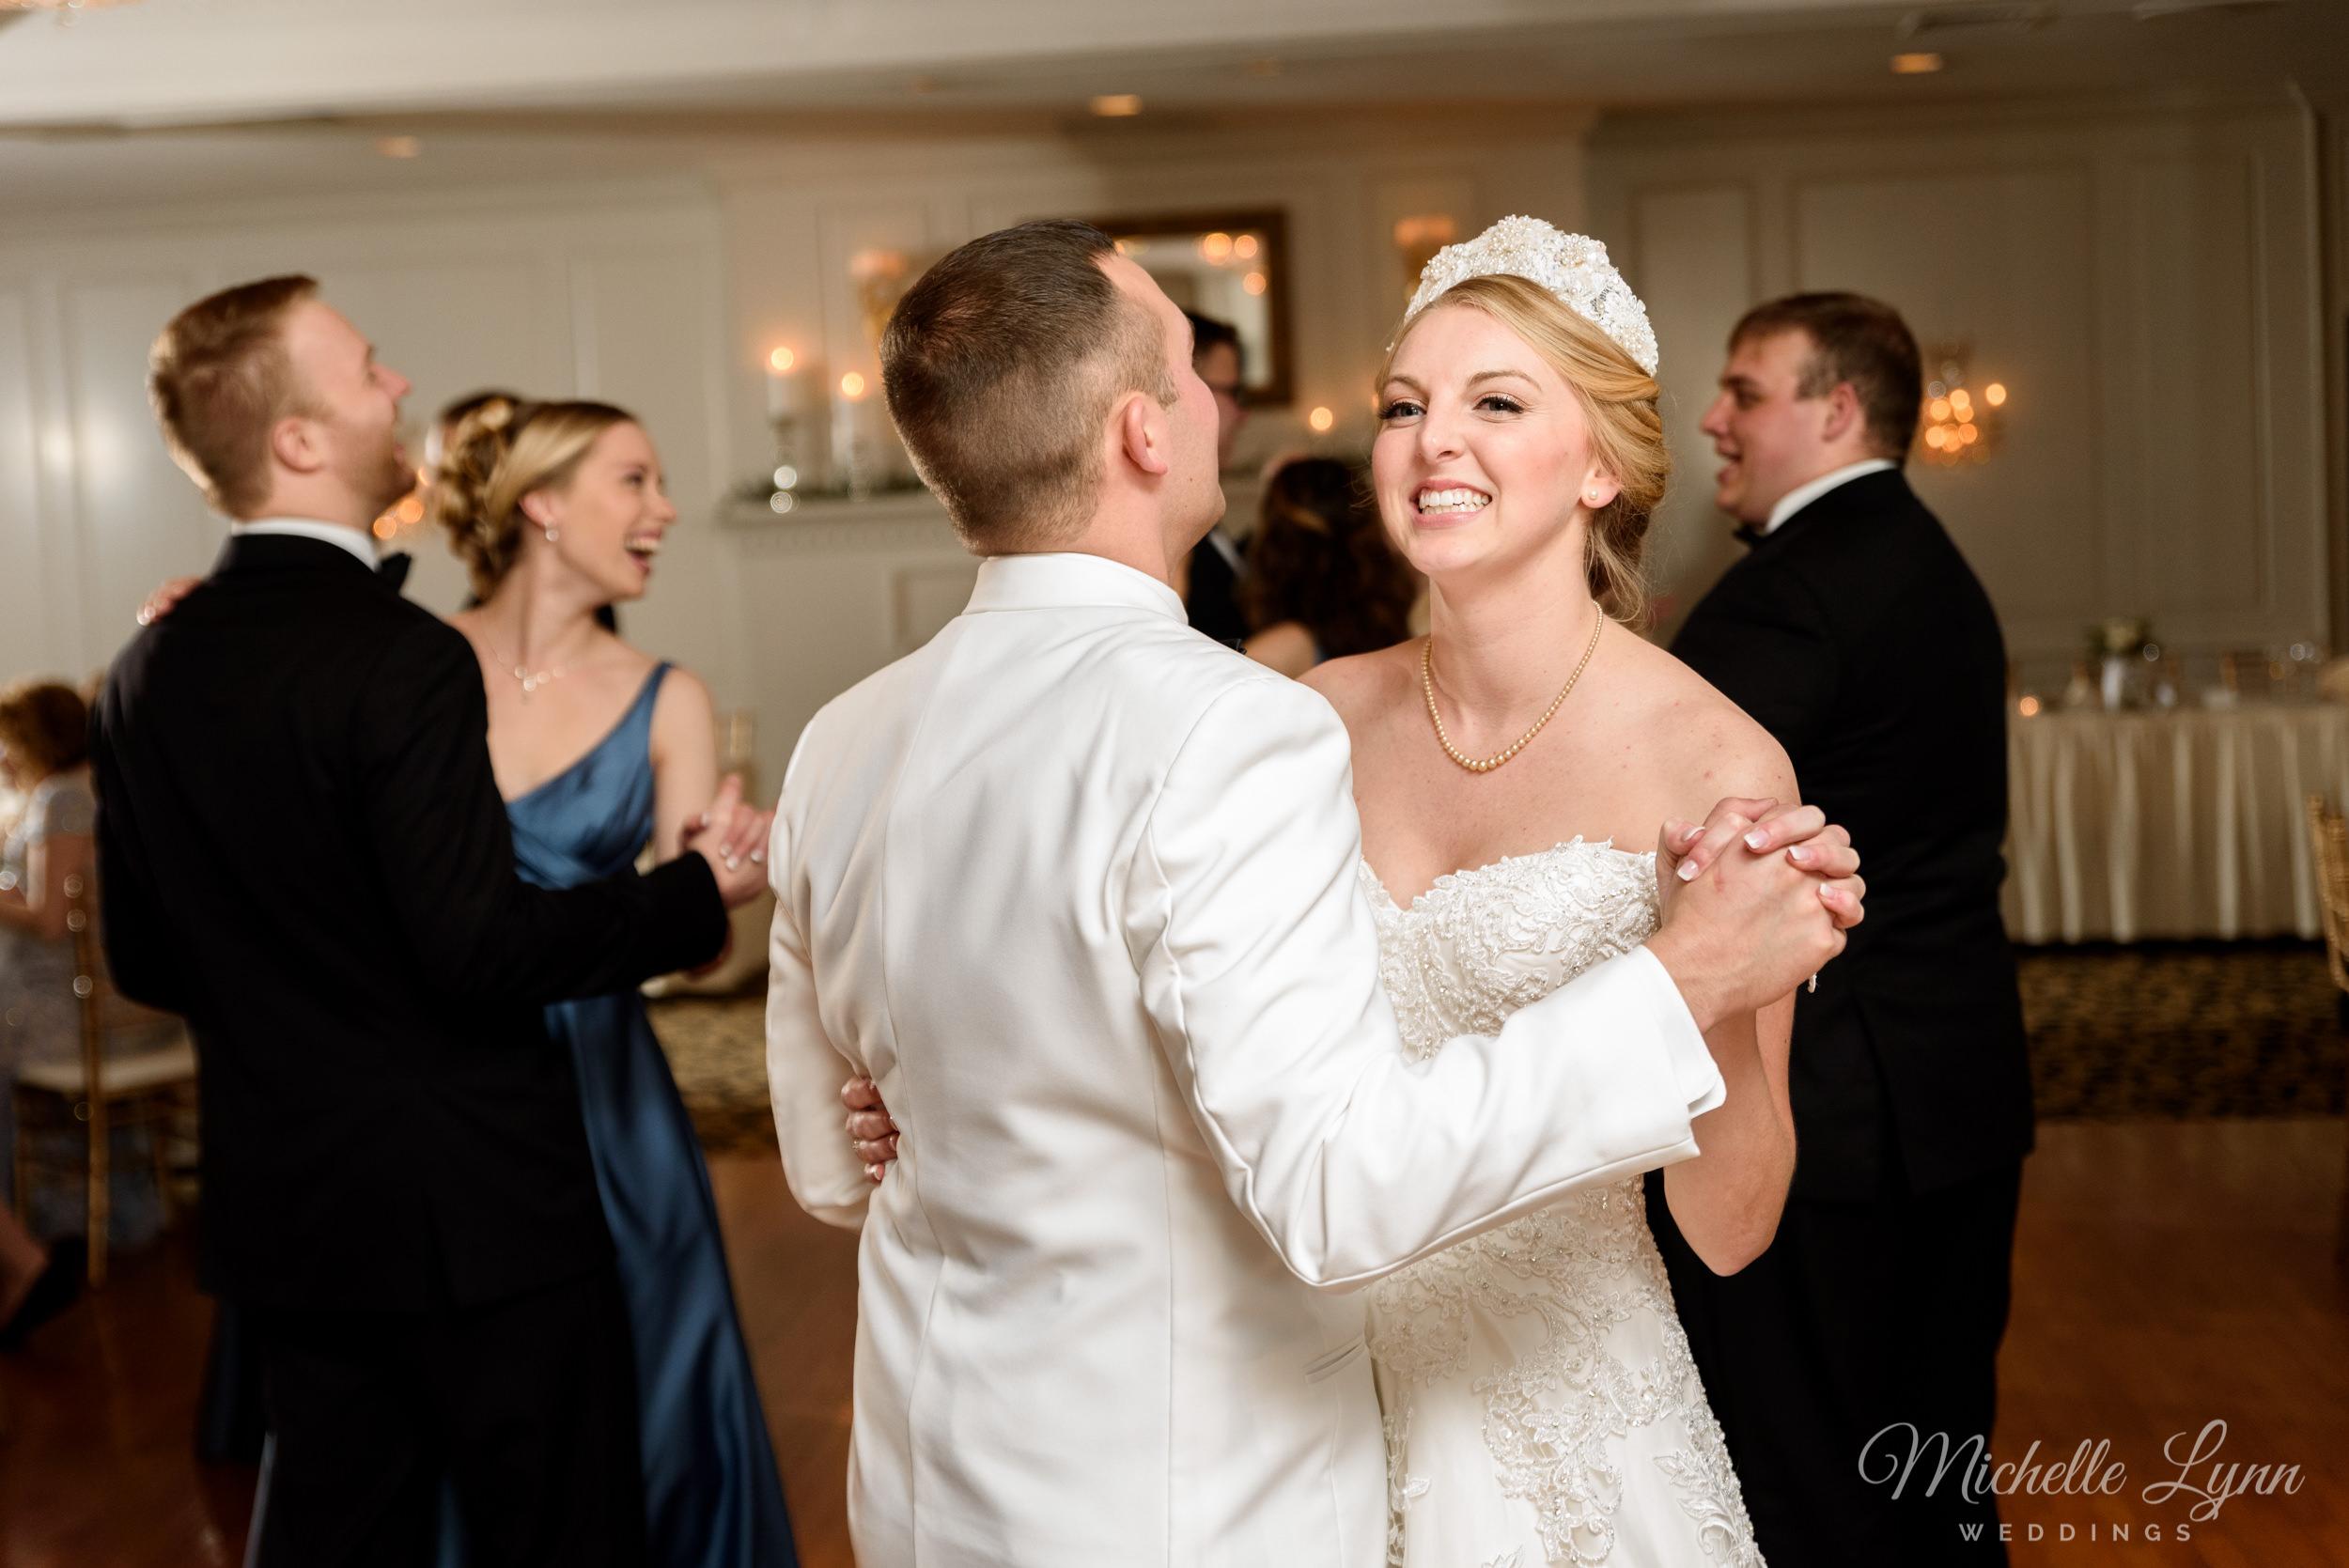 william-penn-inn-wedding-photography-mlw-108.jpg